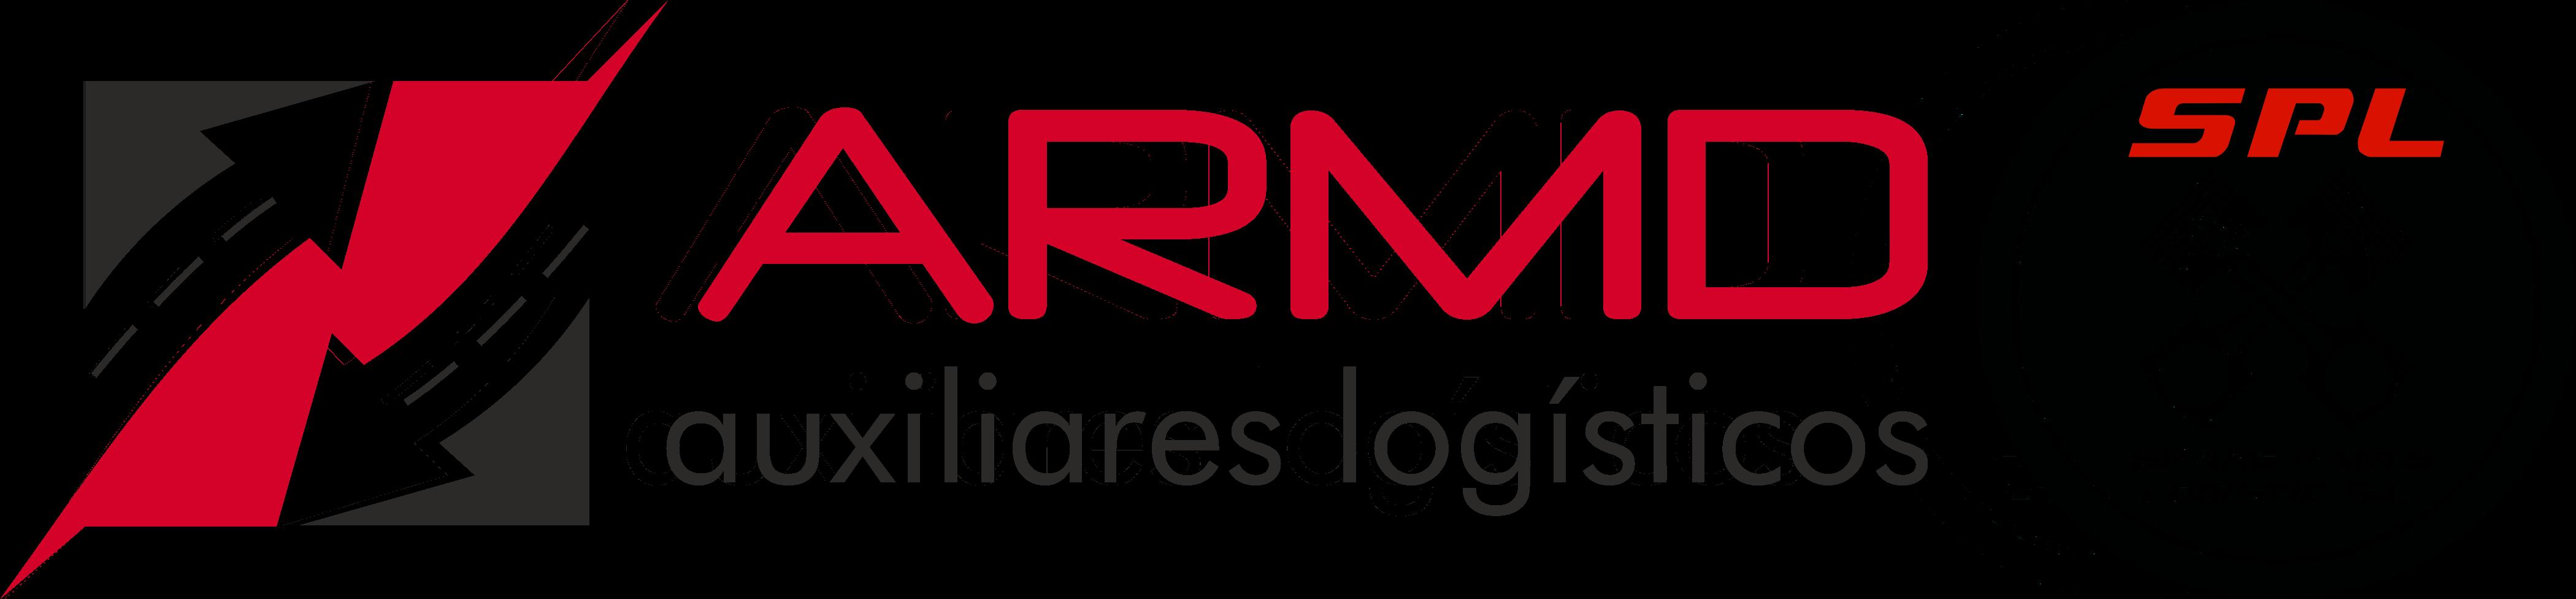 Logo armd 2